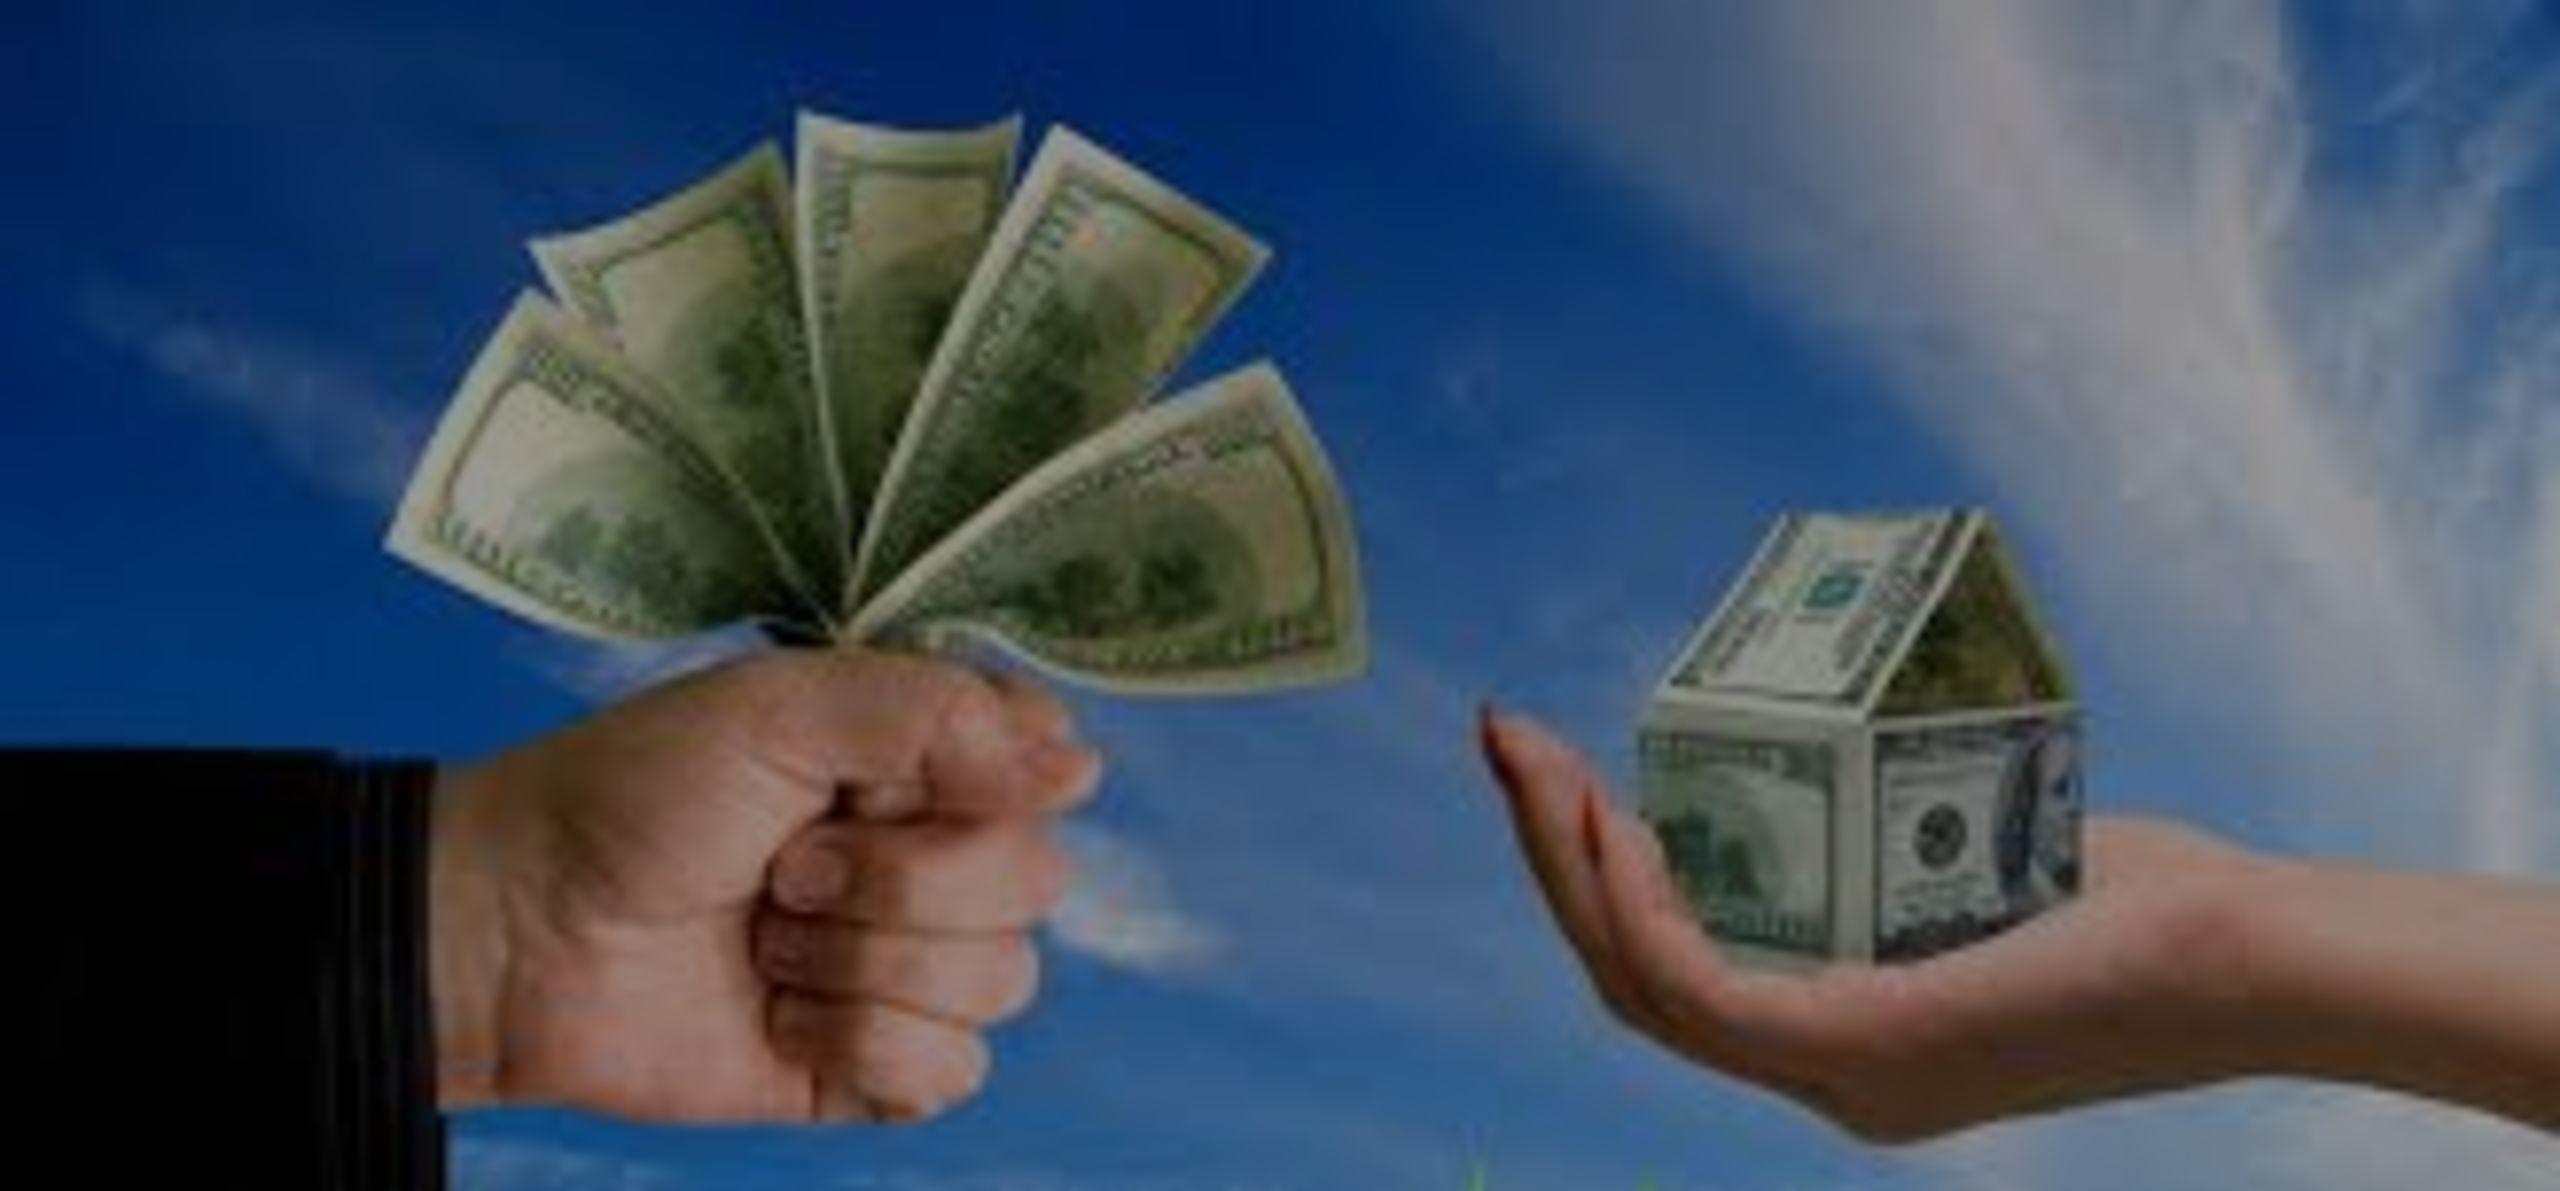 Real estate investment in Las Vegas